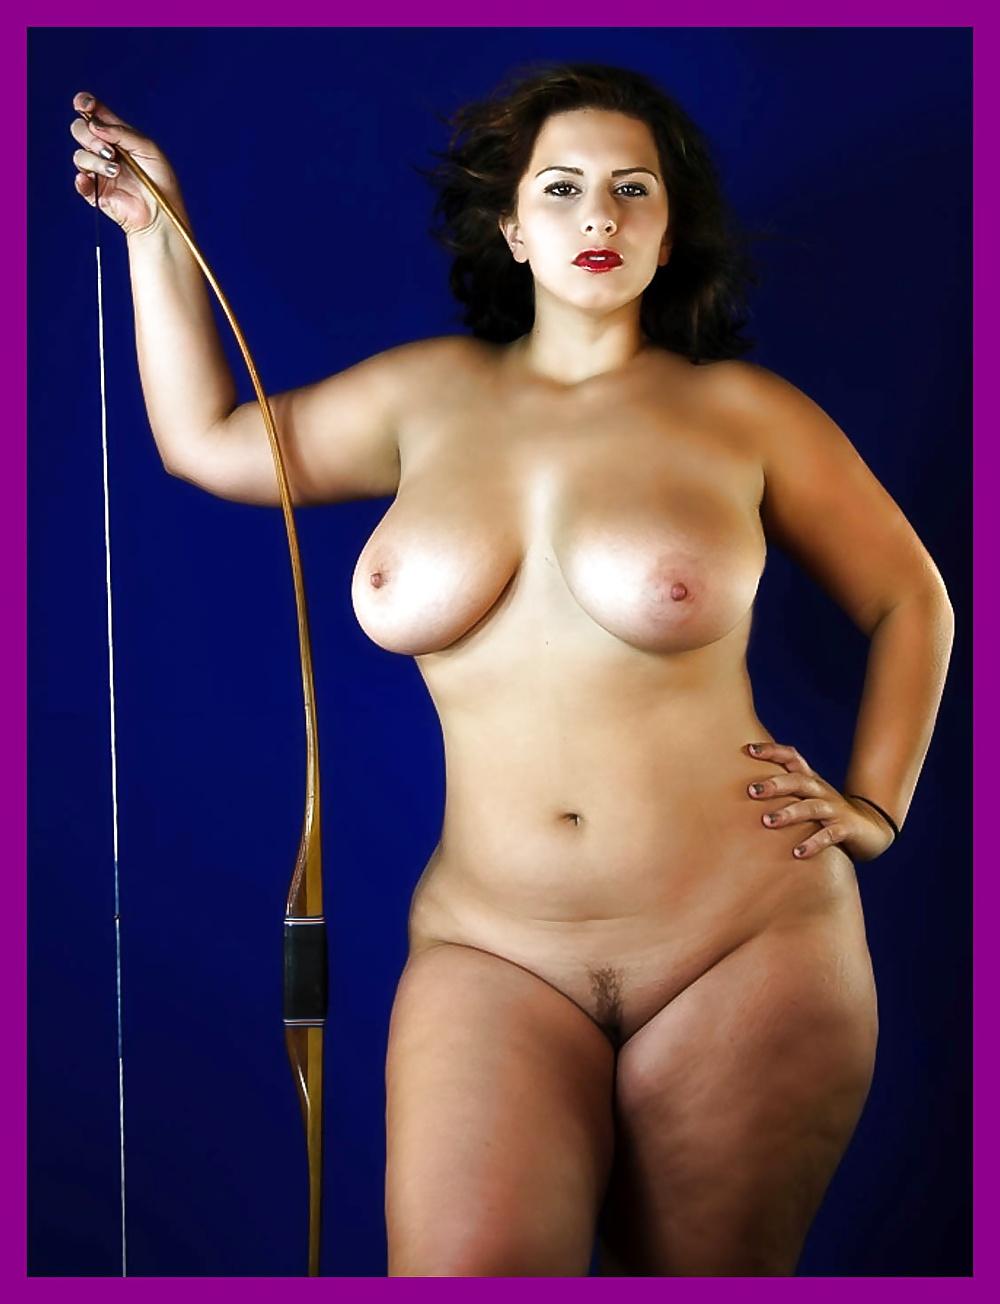 Artistic nudes of mature full figured women — photo 8